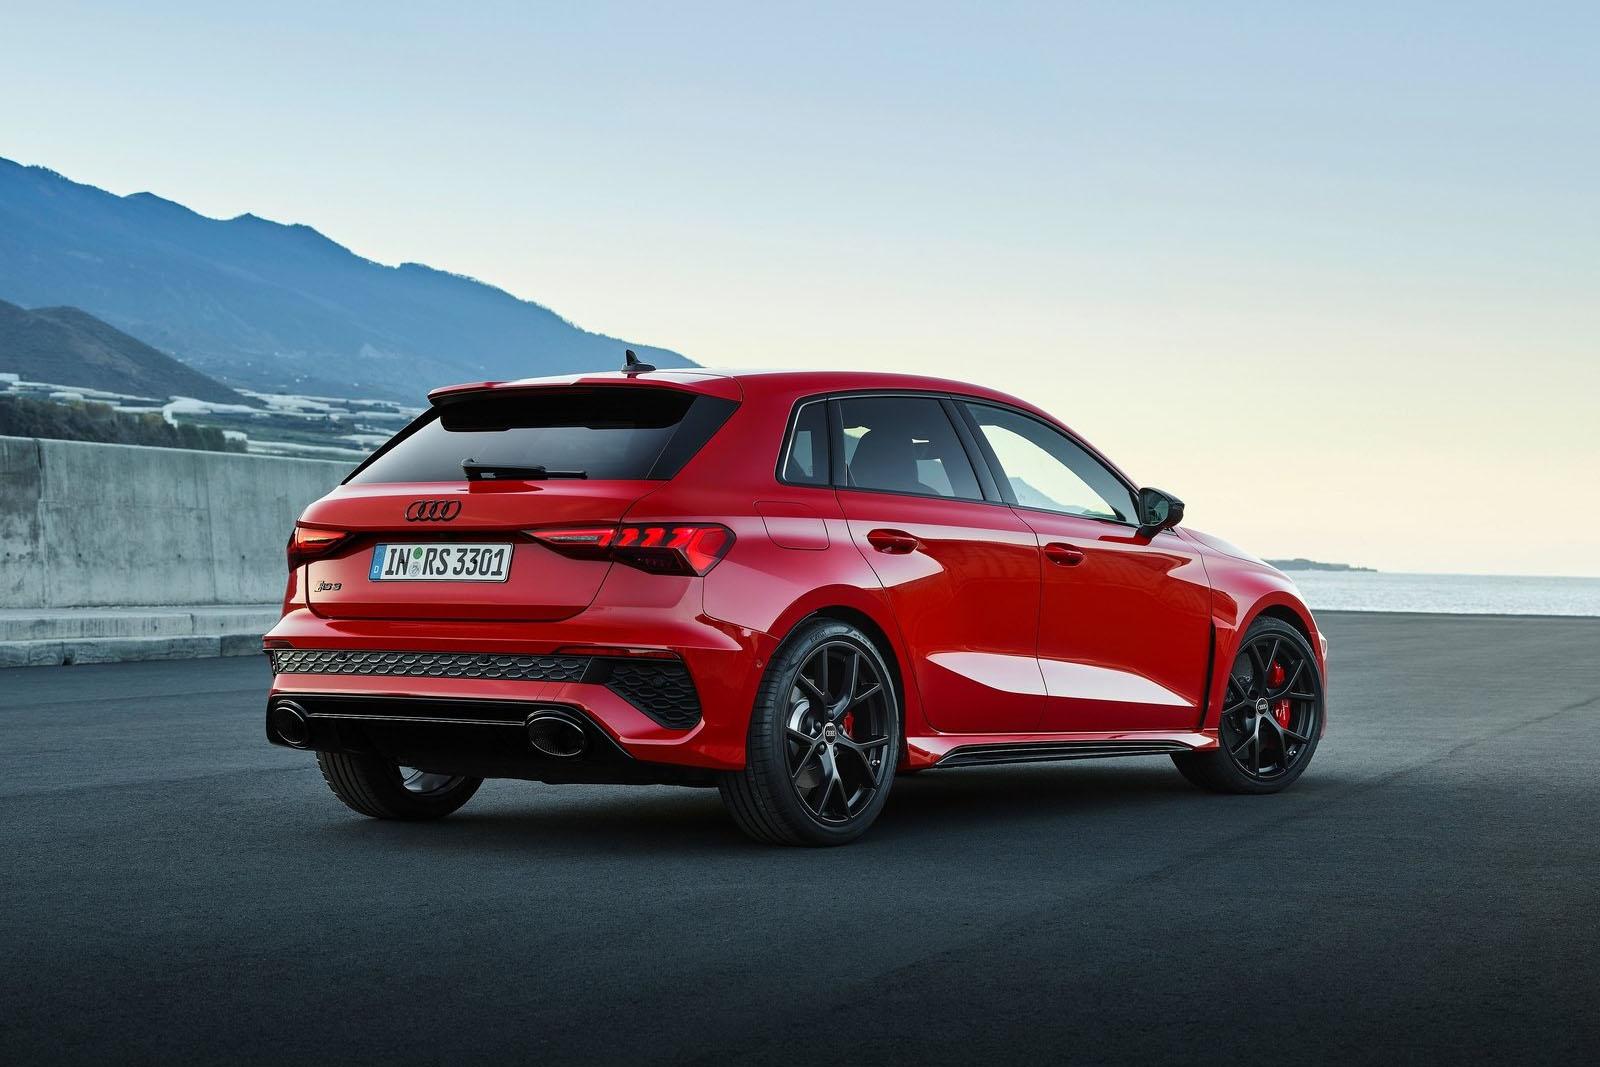 Audi-RS3-2022-Rear